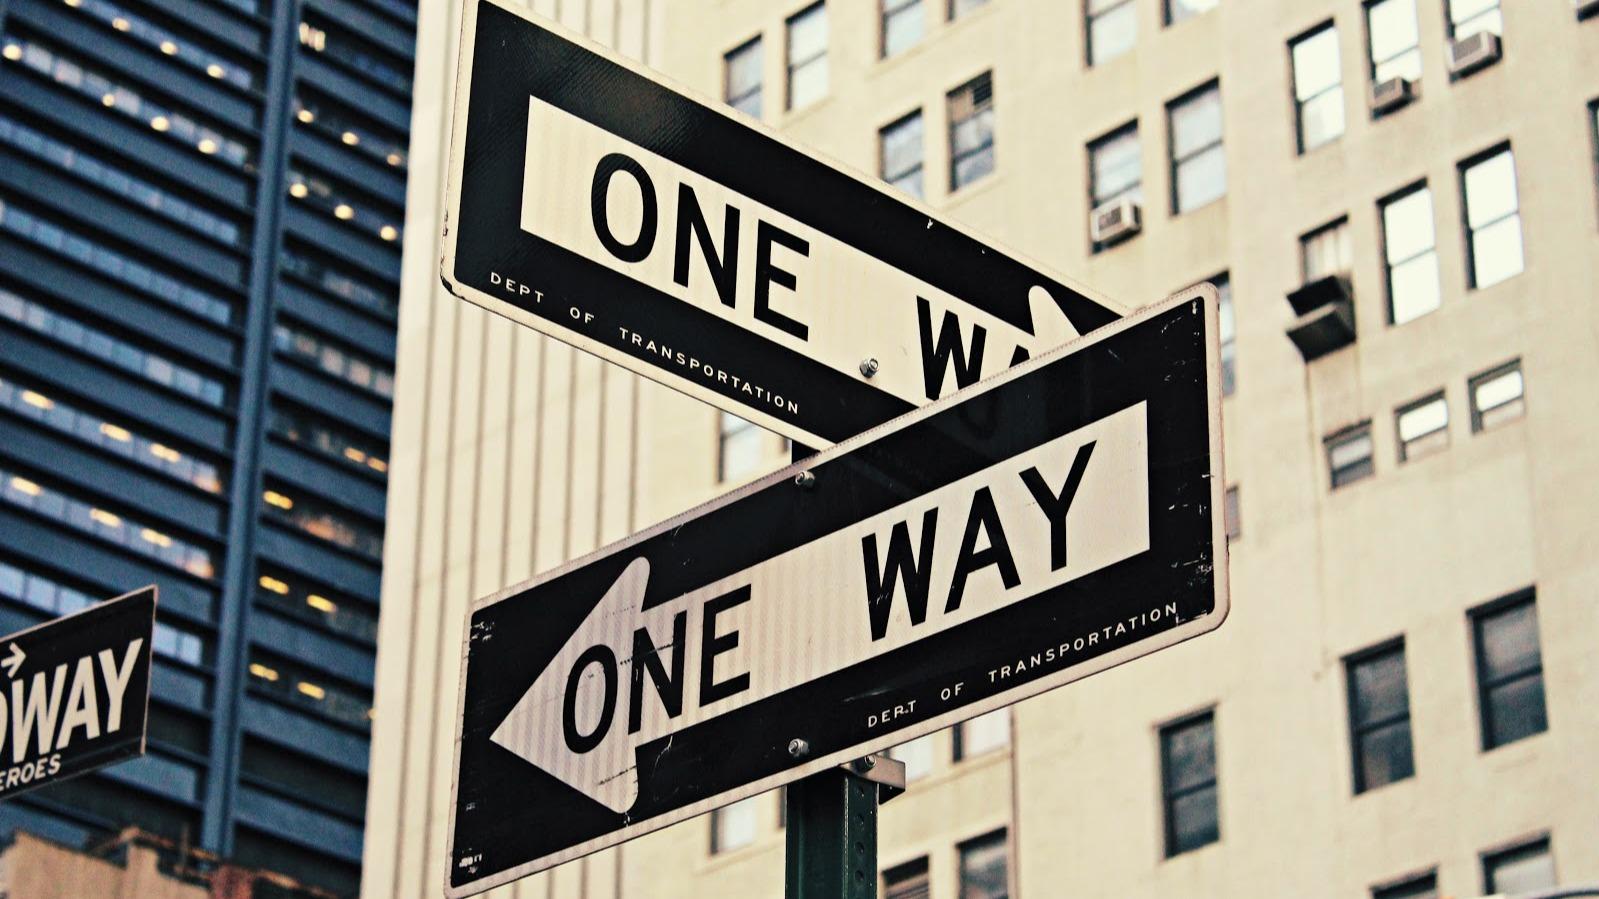 Is Social Media a One-Way Street?